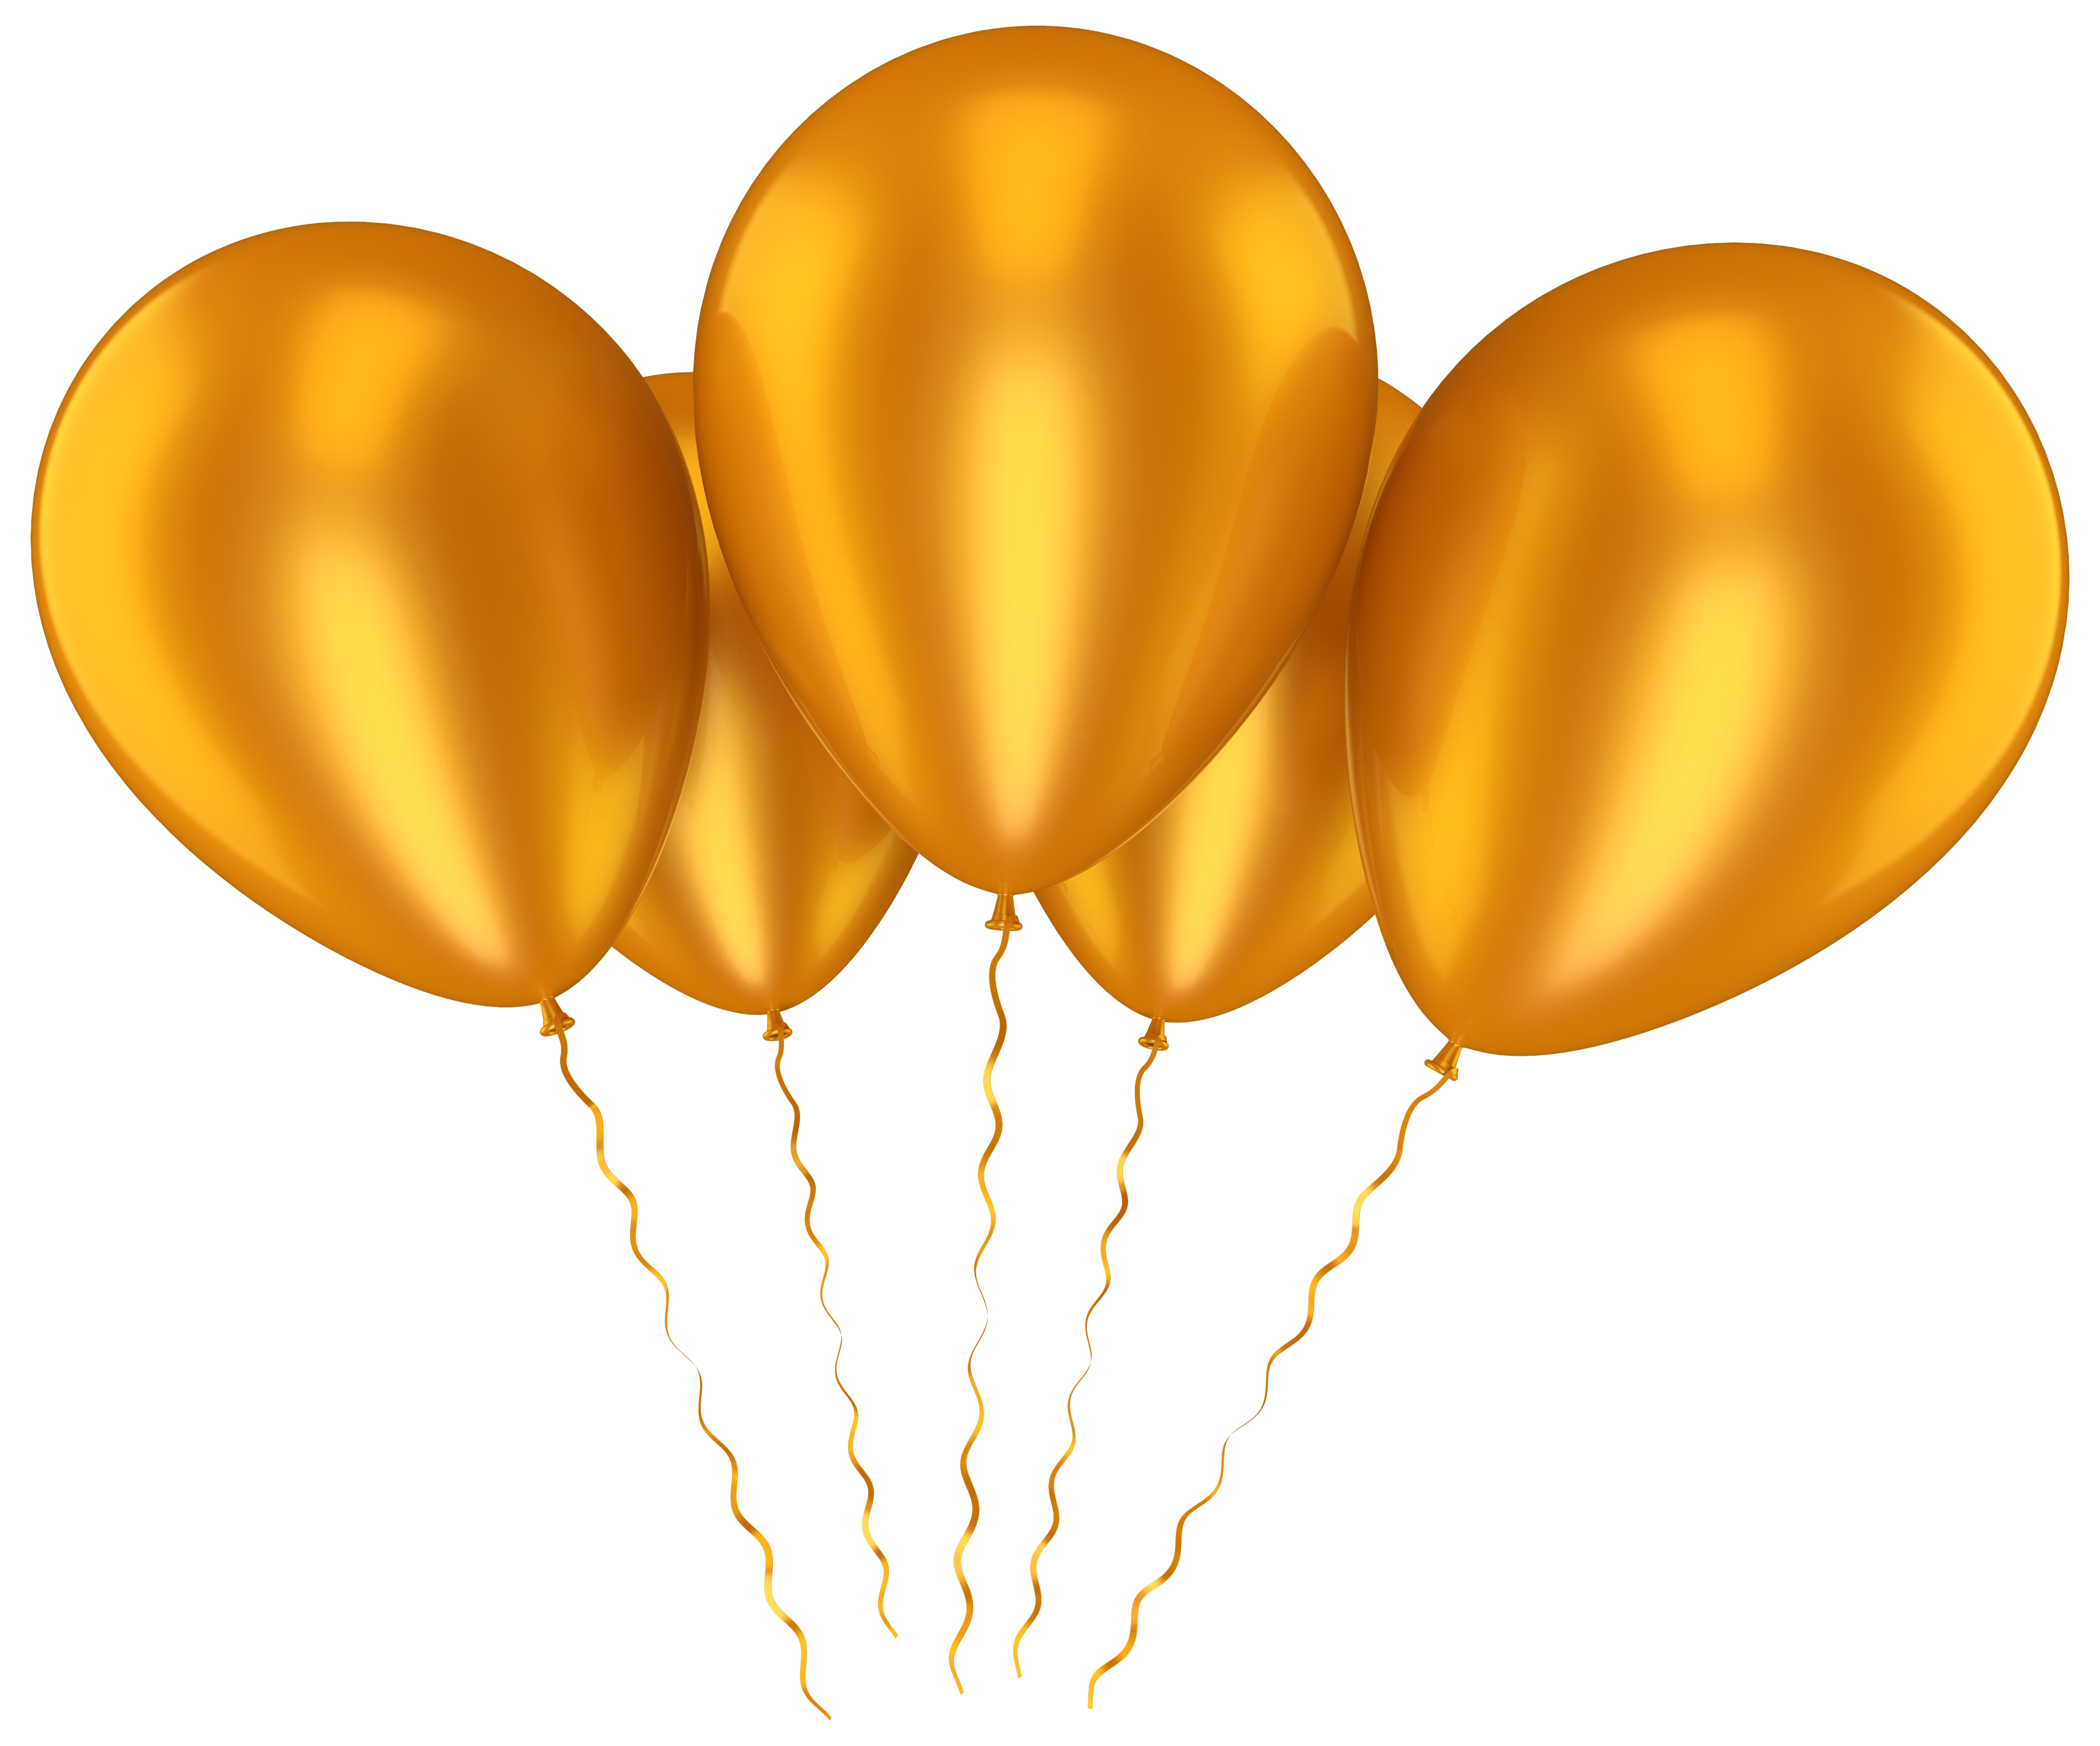 Peach clipart balloon. Gold balloons transparent clip